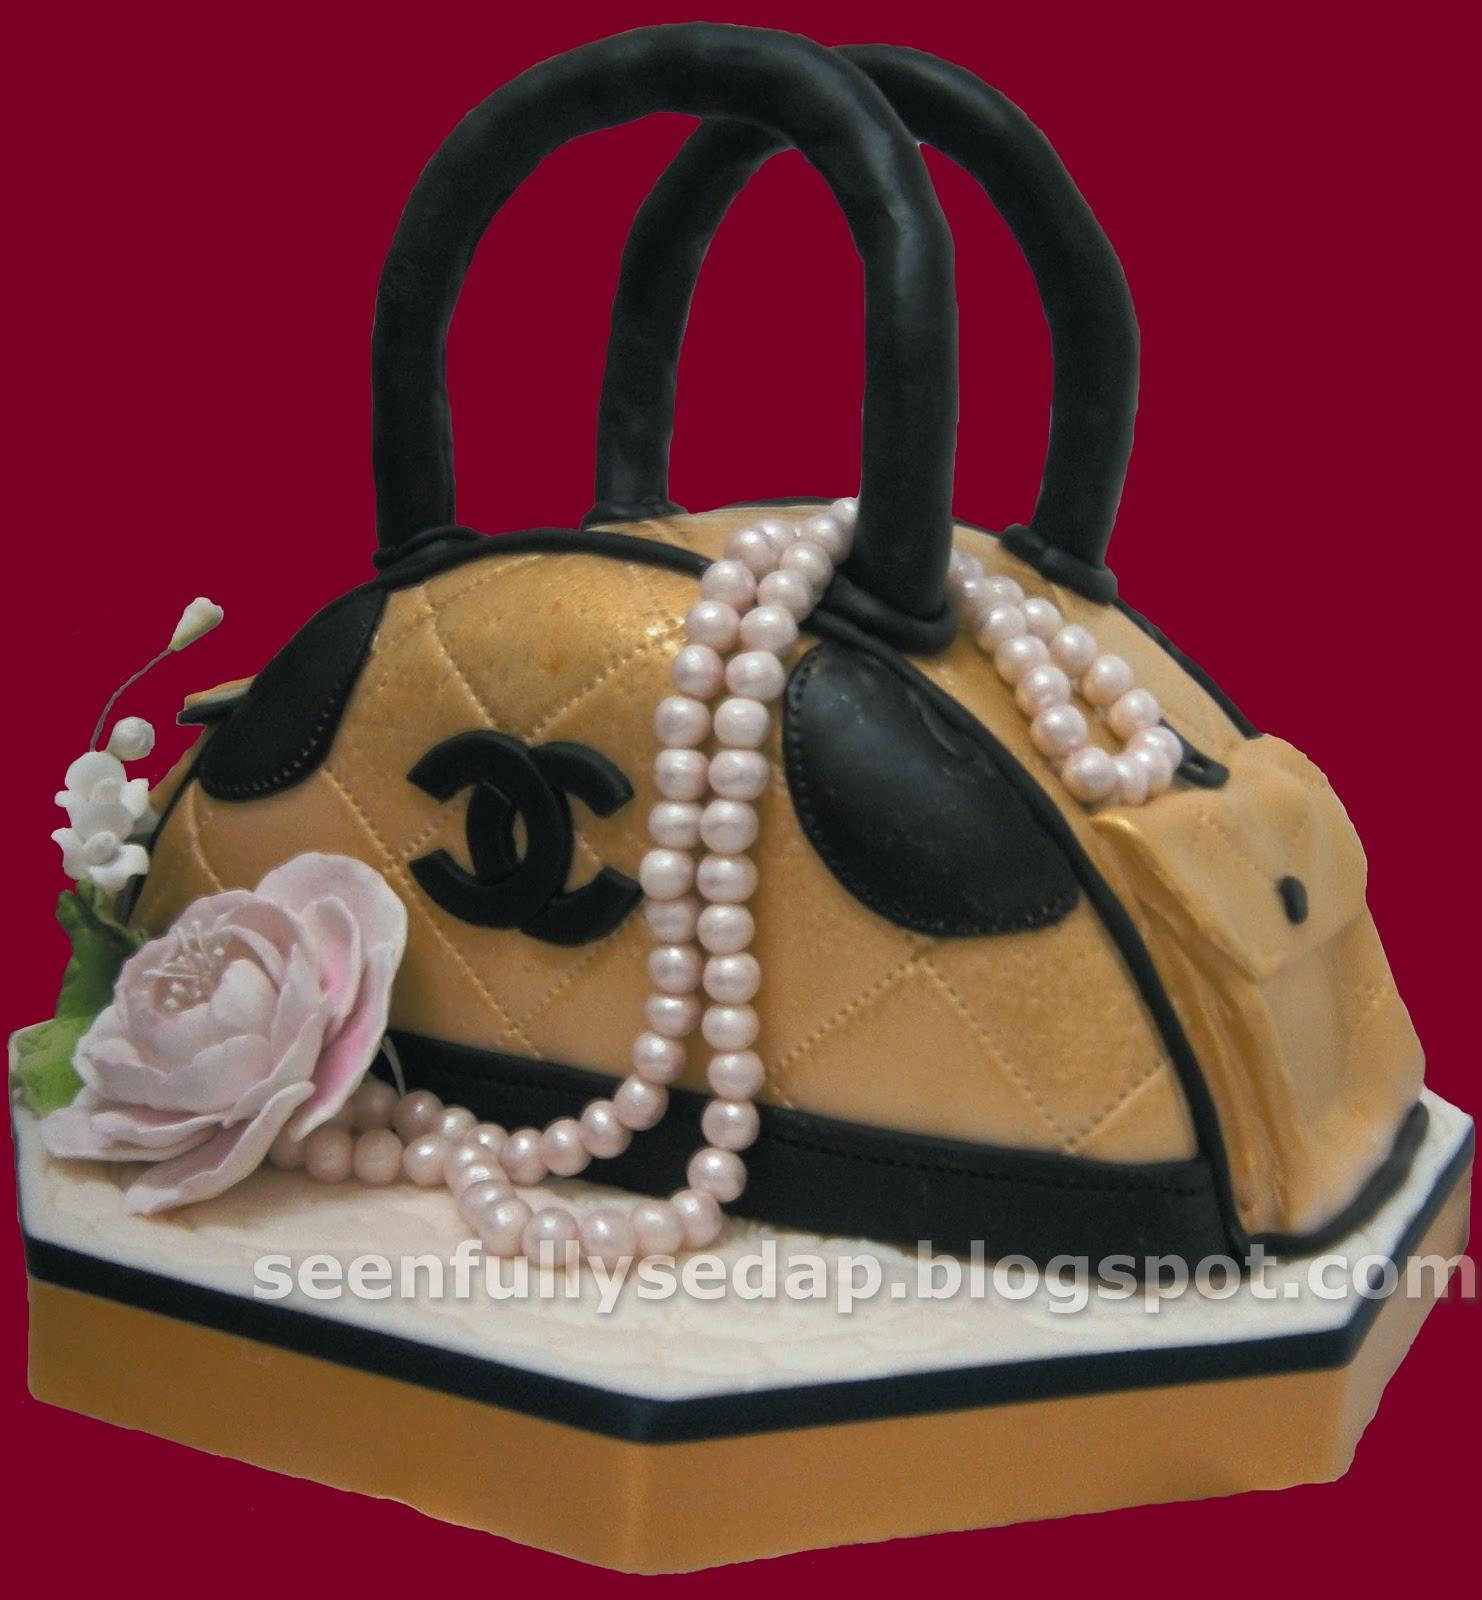 Chanel Cake Designs: Seenfully Sedap: Coco Chanel Handbag Cake